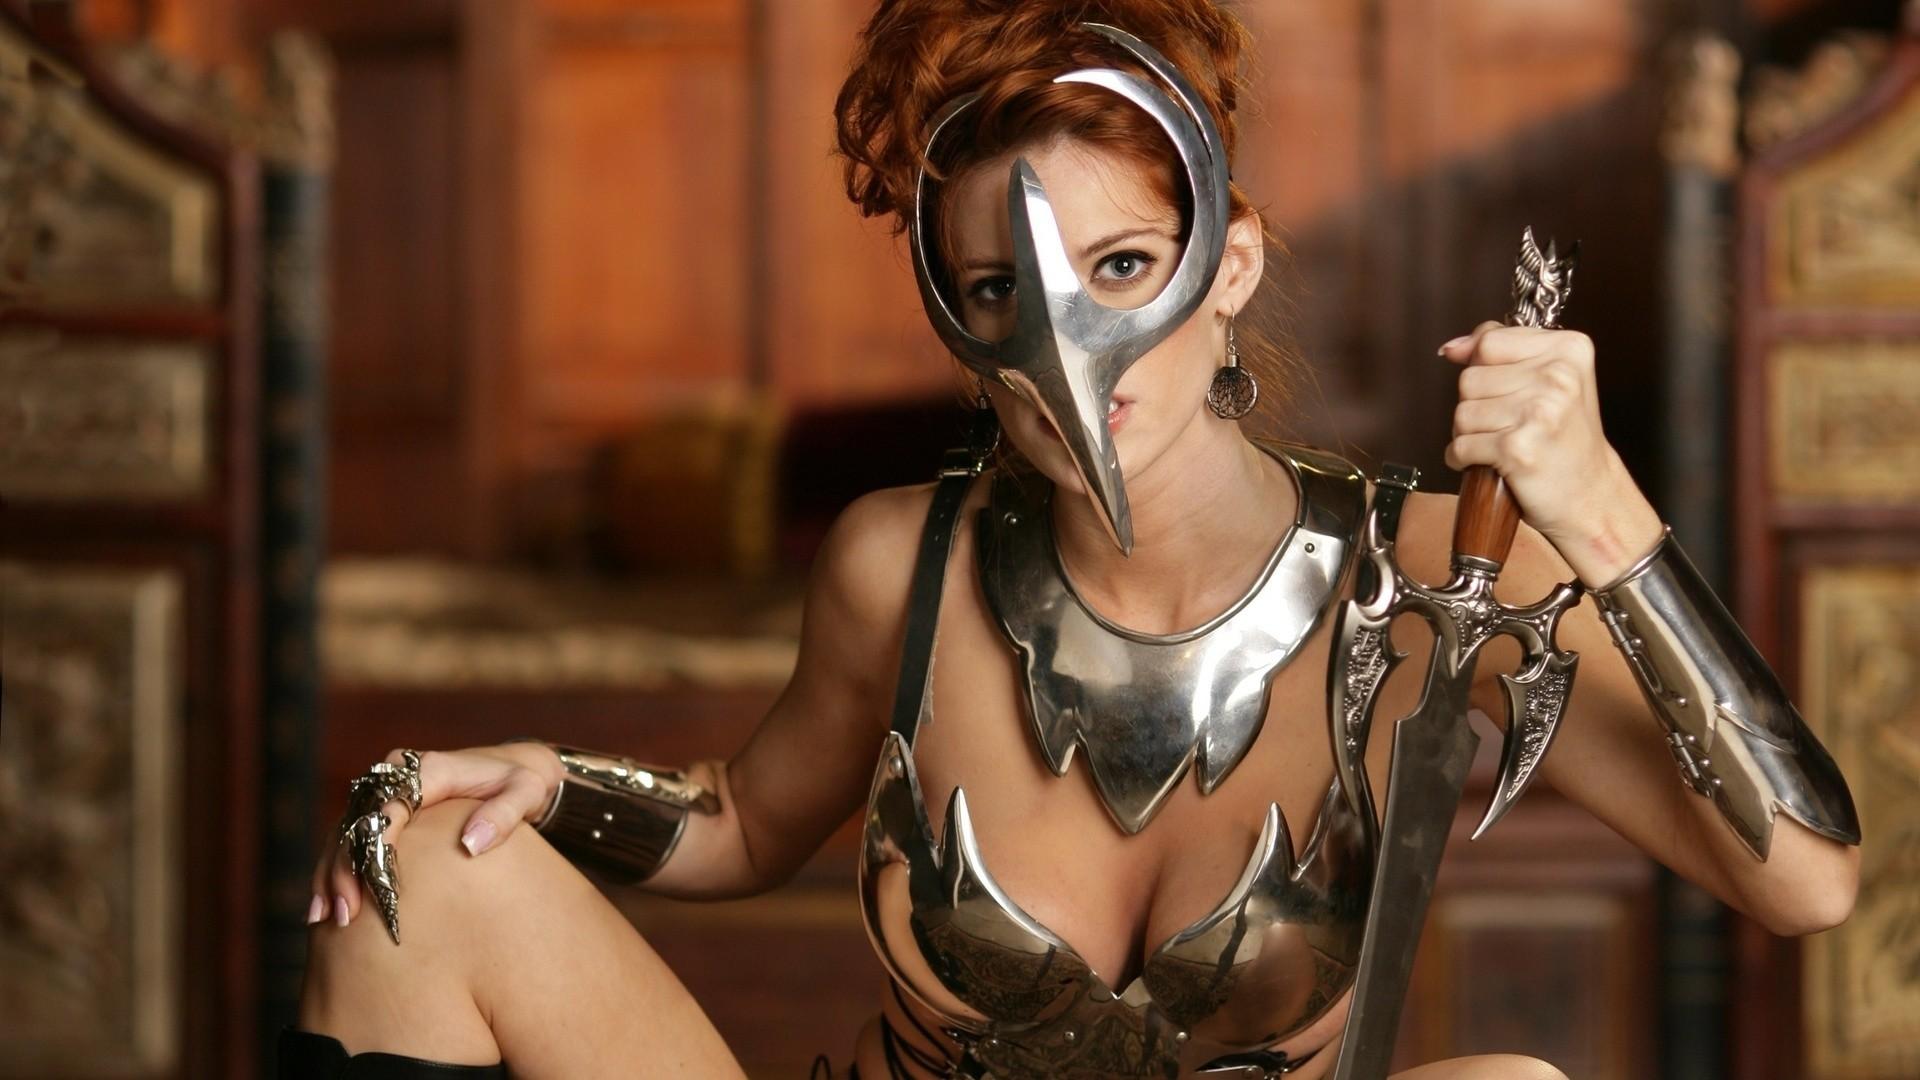 Free warrior cosplay wallpaper background